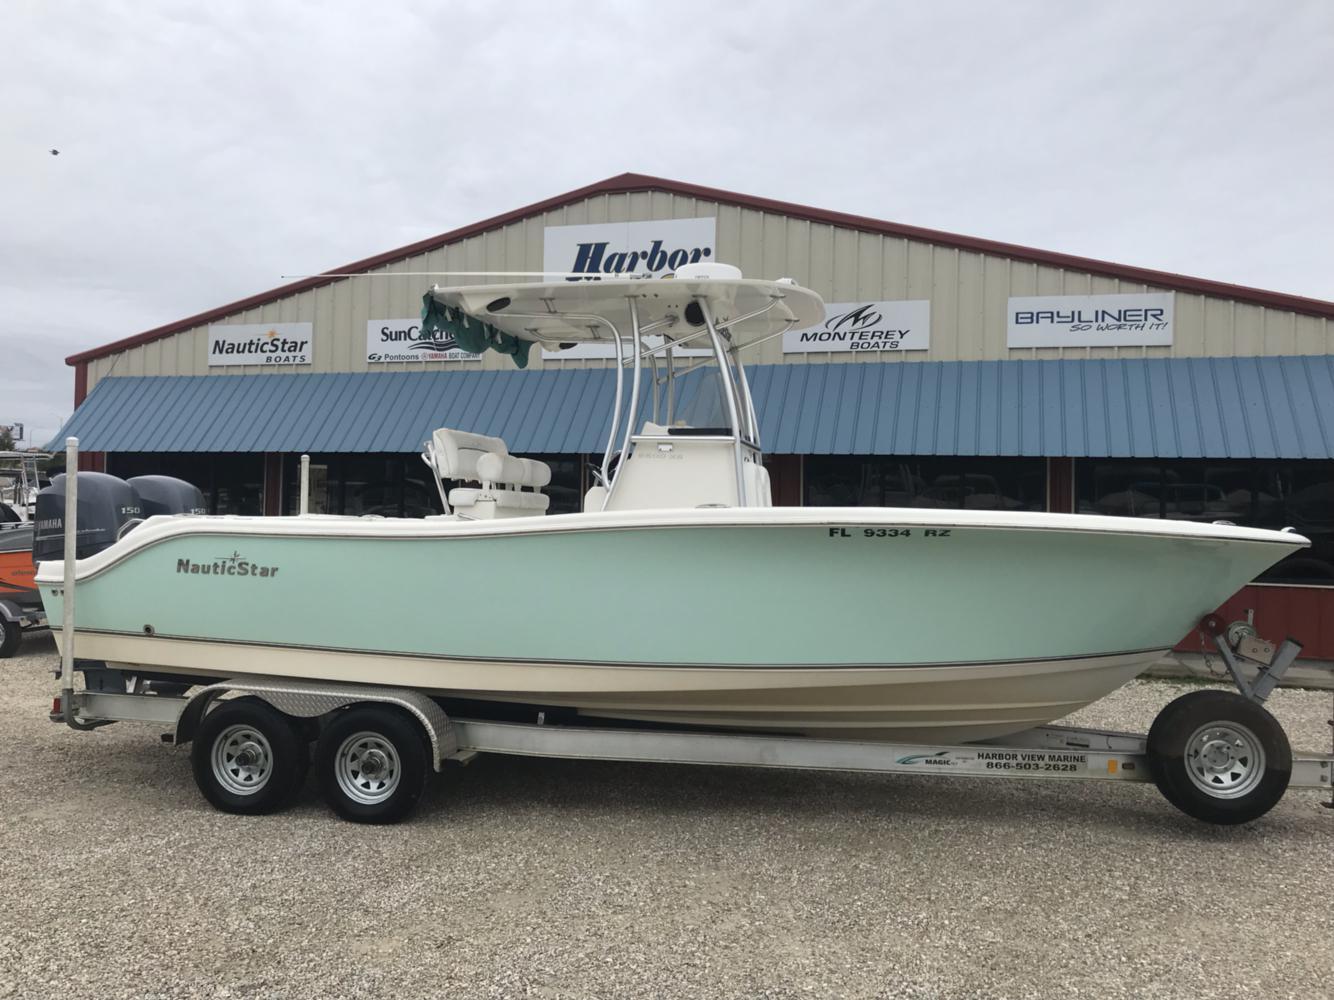 NauticStar XS Series Boat 2500 Off Shore 25 XS 25XS